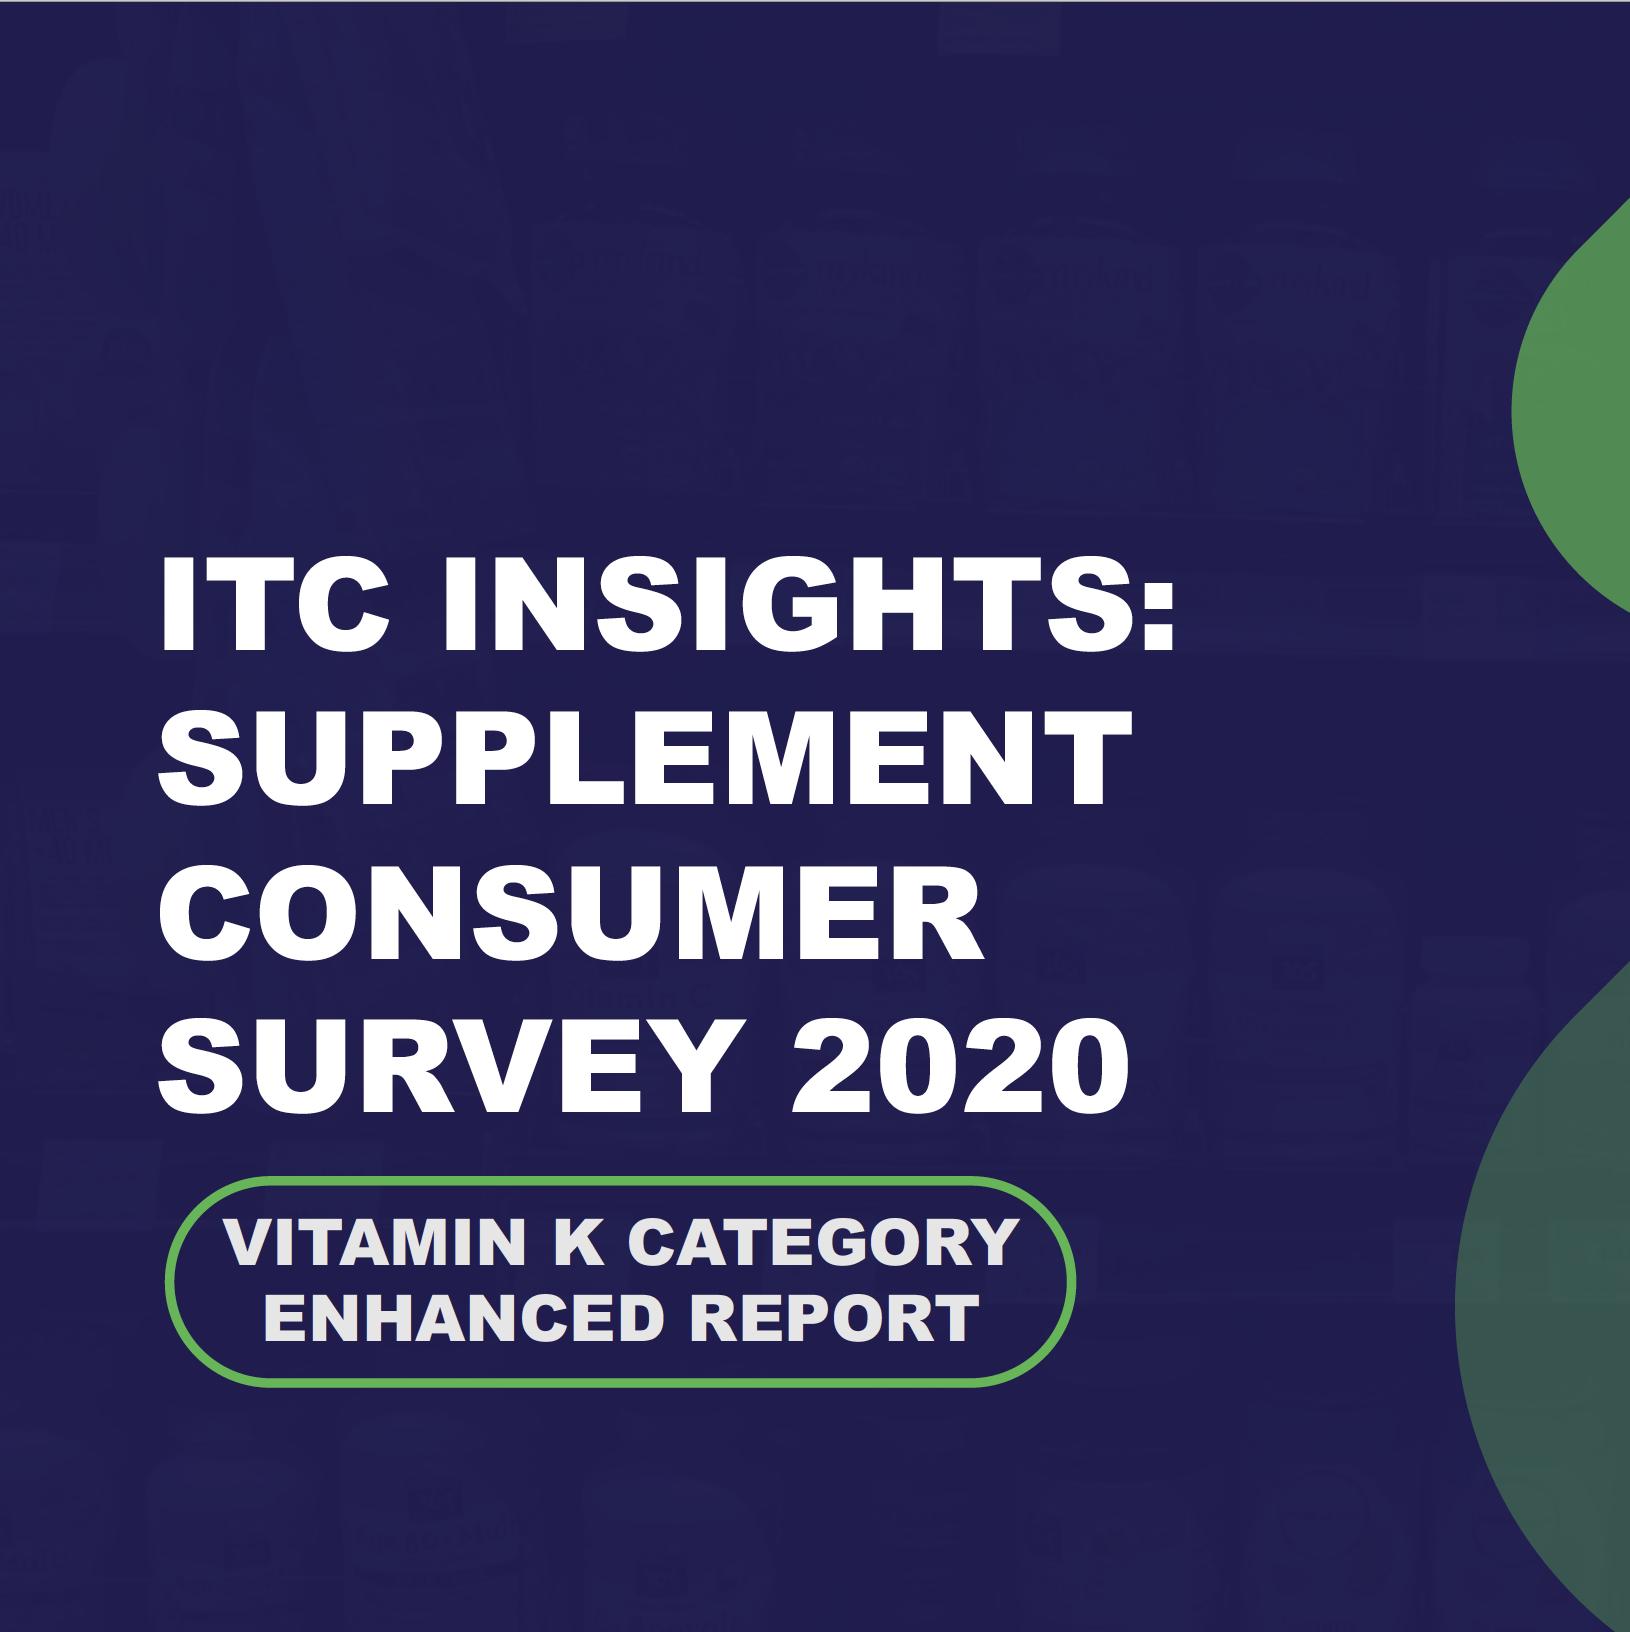 ITC Insights Vitamin K Report Cover